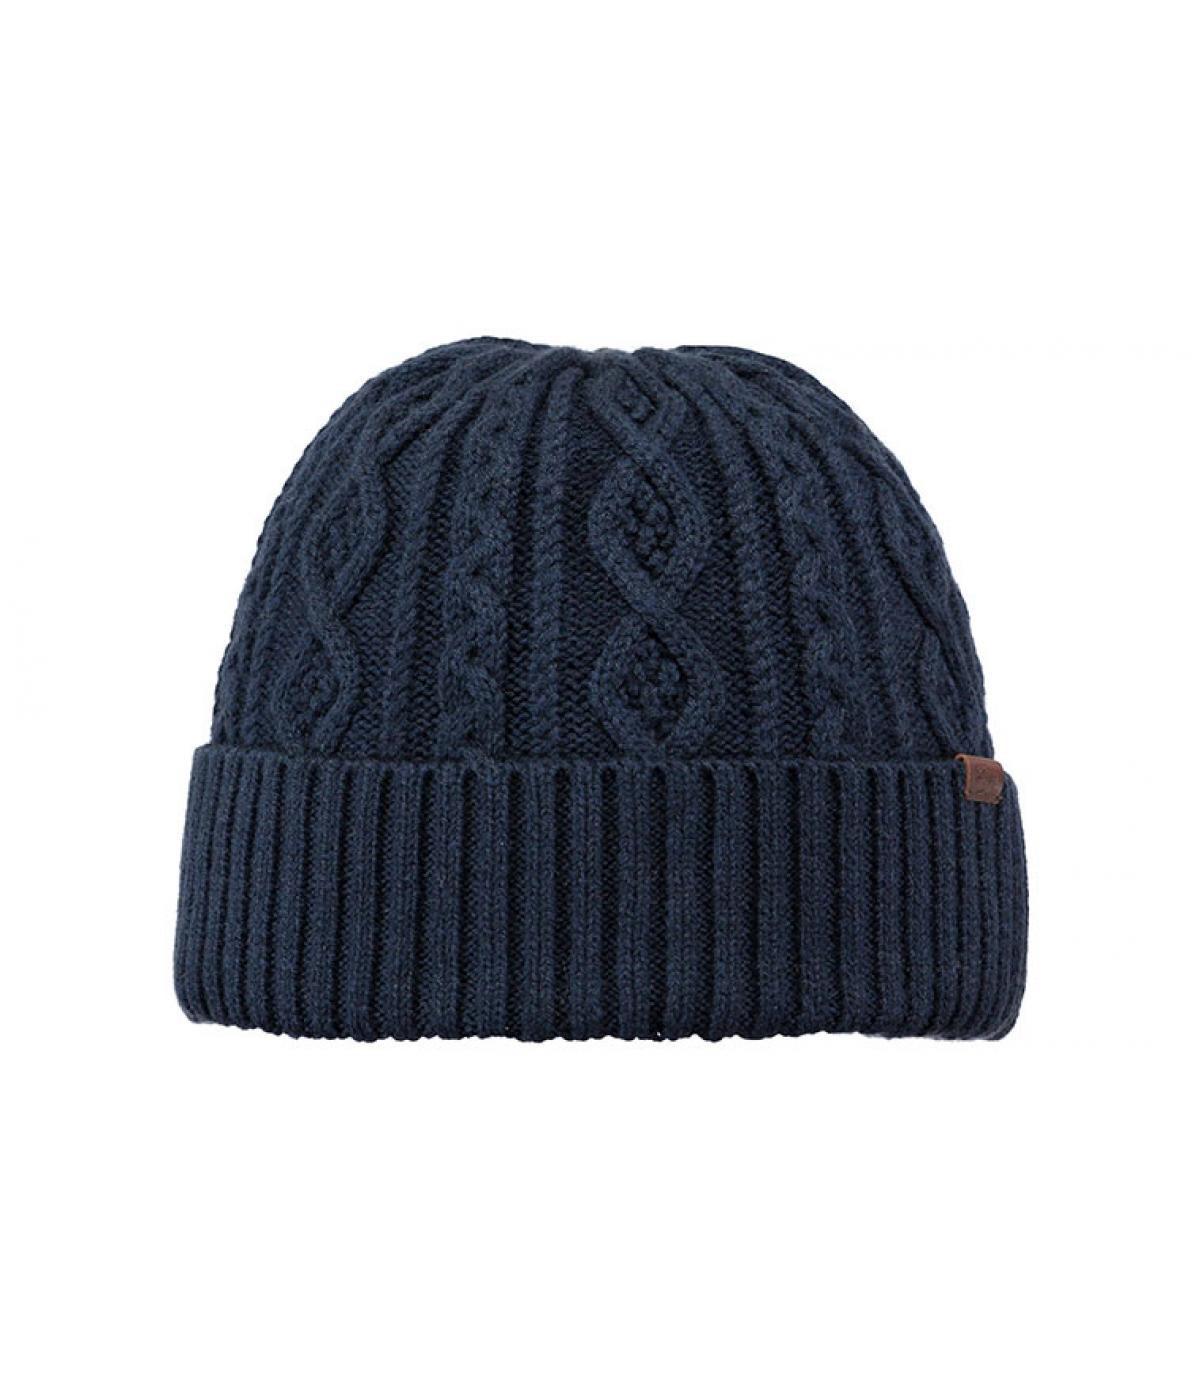 bonnet bleu marine revers torsade